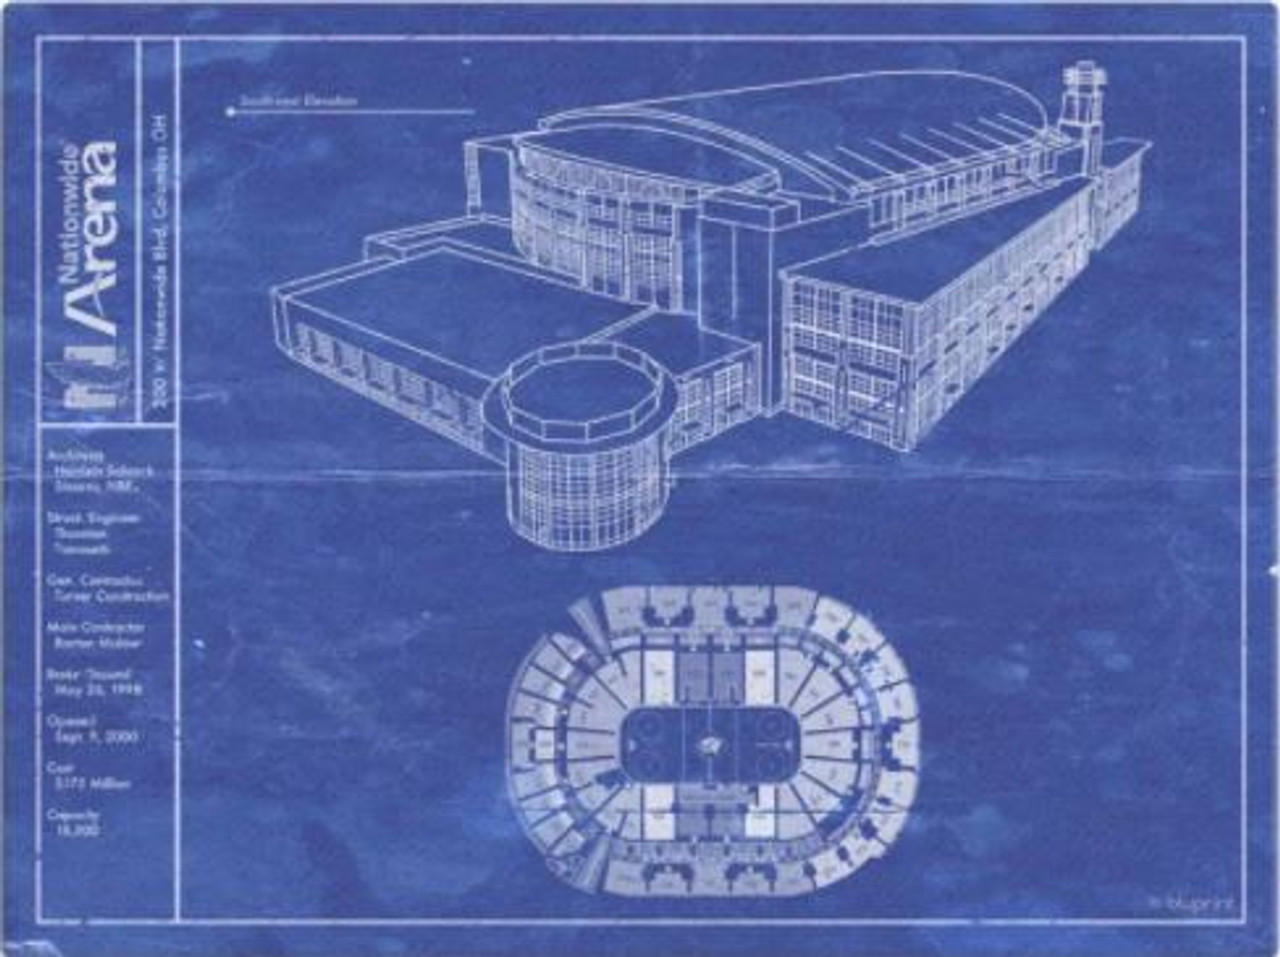 Nationwide Arena - Columbus Blue Jackets Blueprint Poster